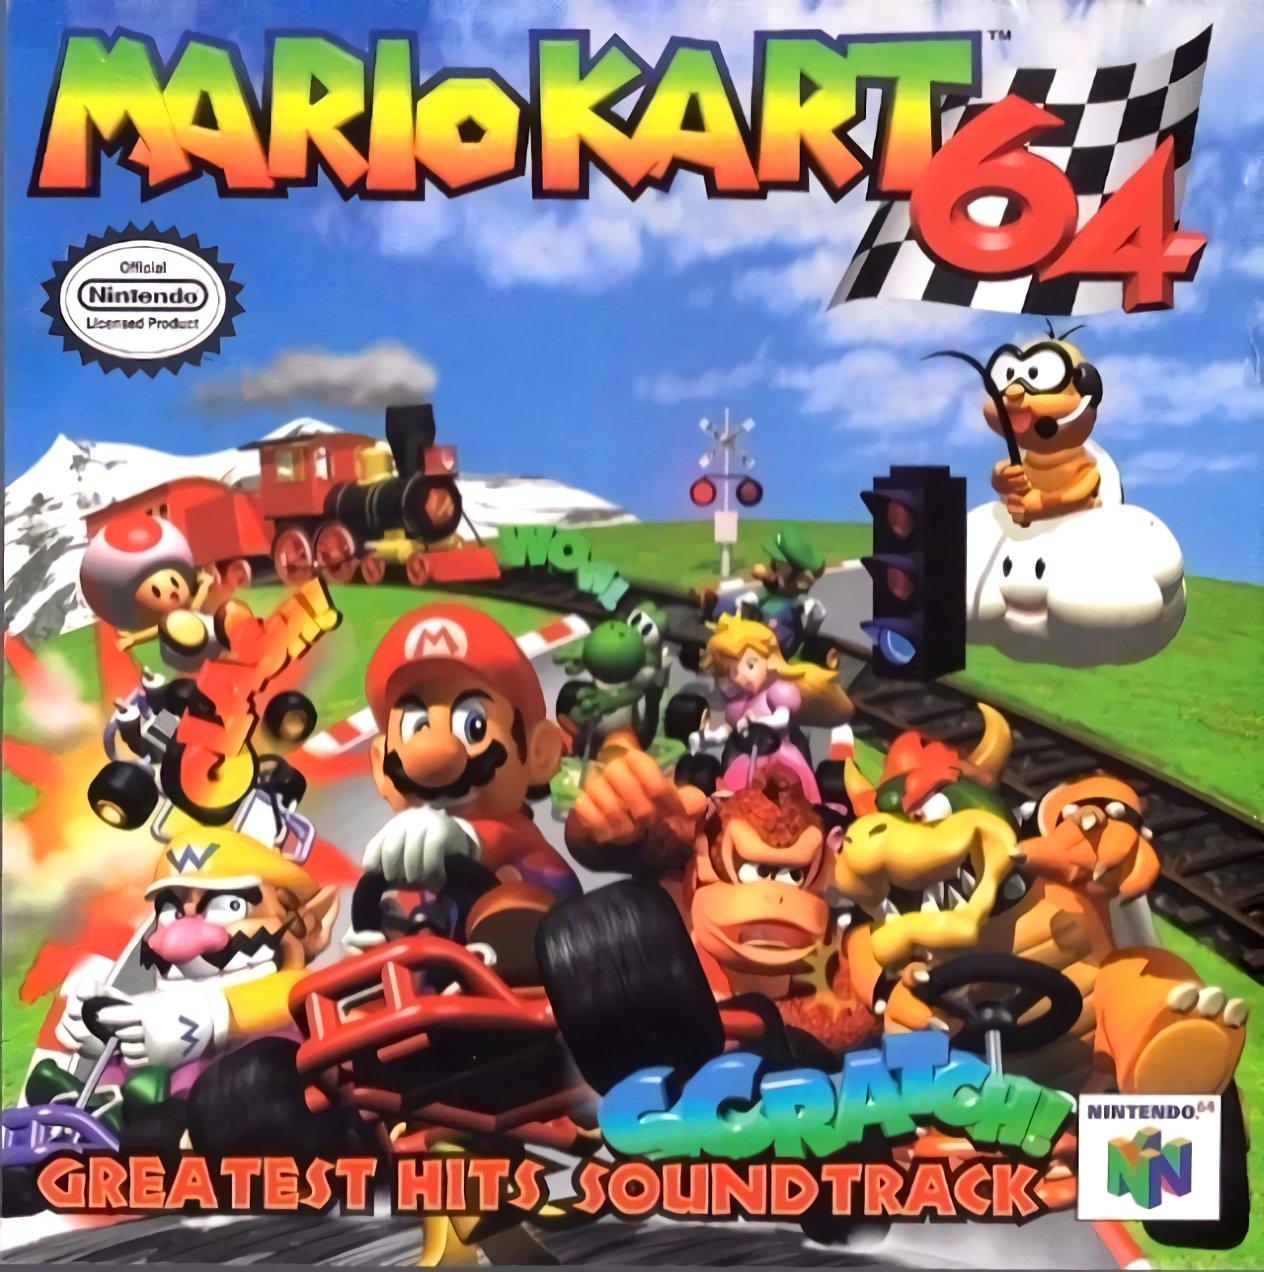 Mario Kart 64: Greatest Hits Soundtrack